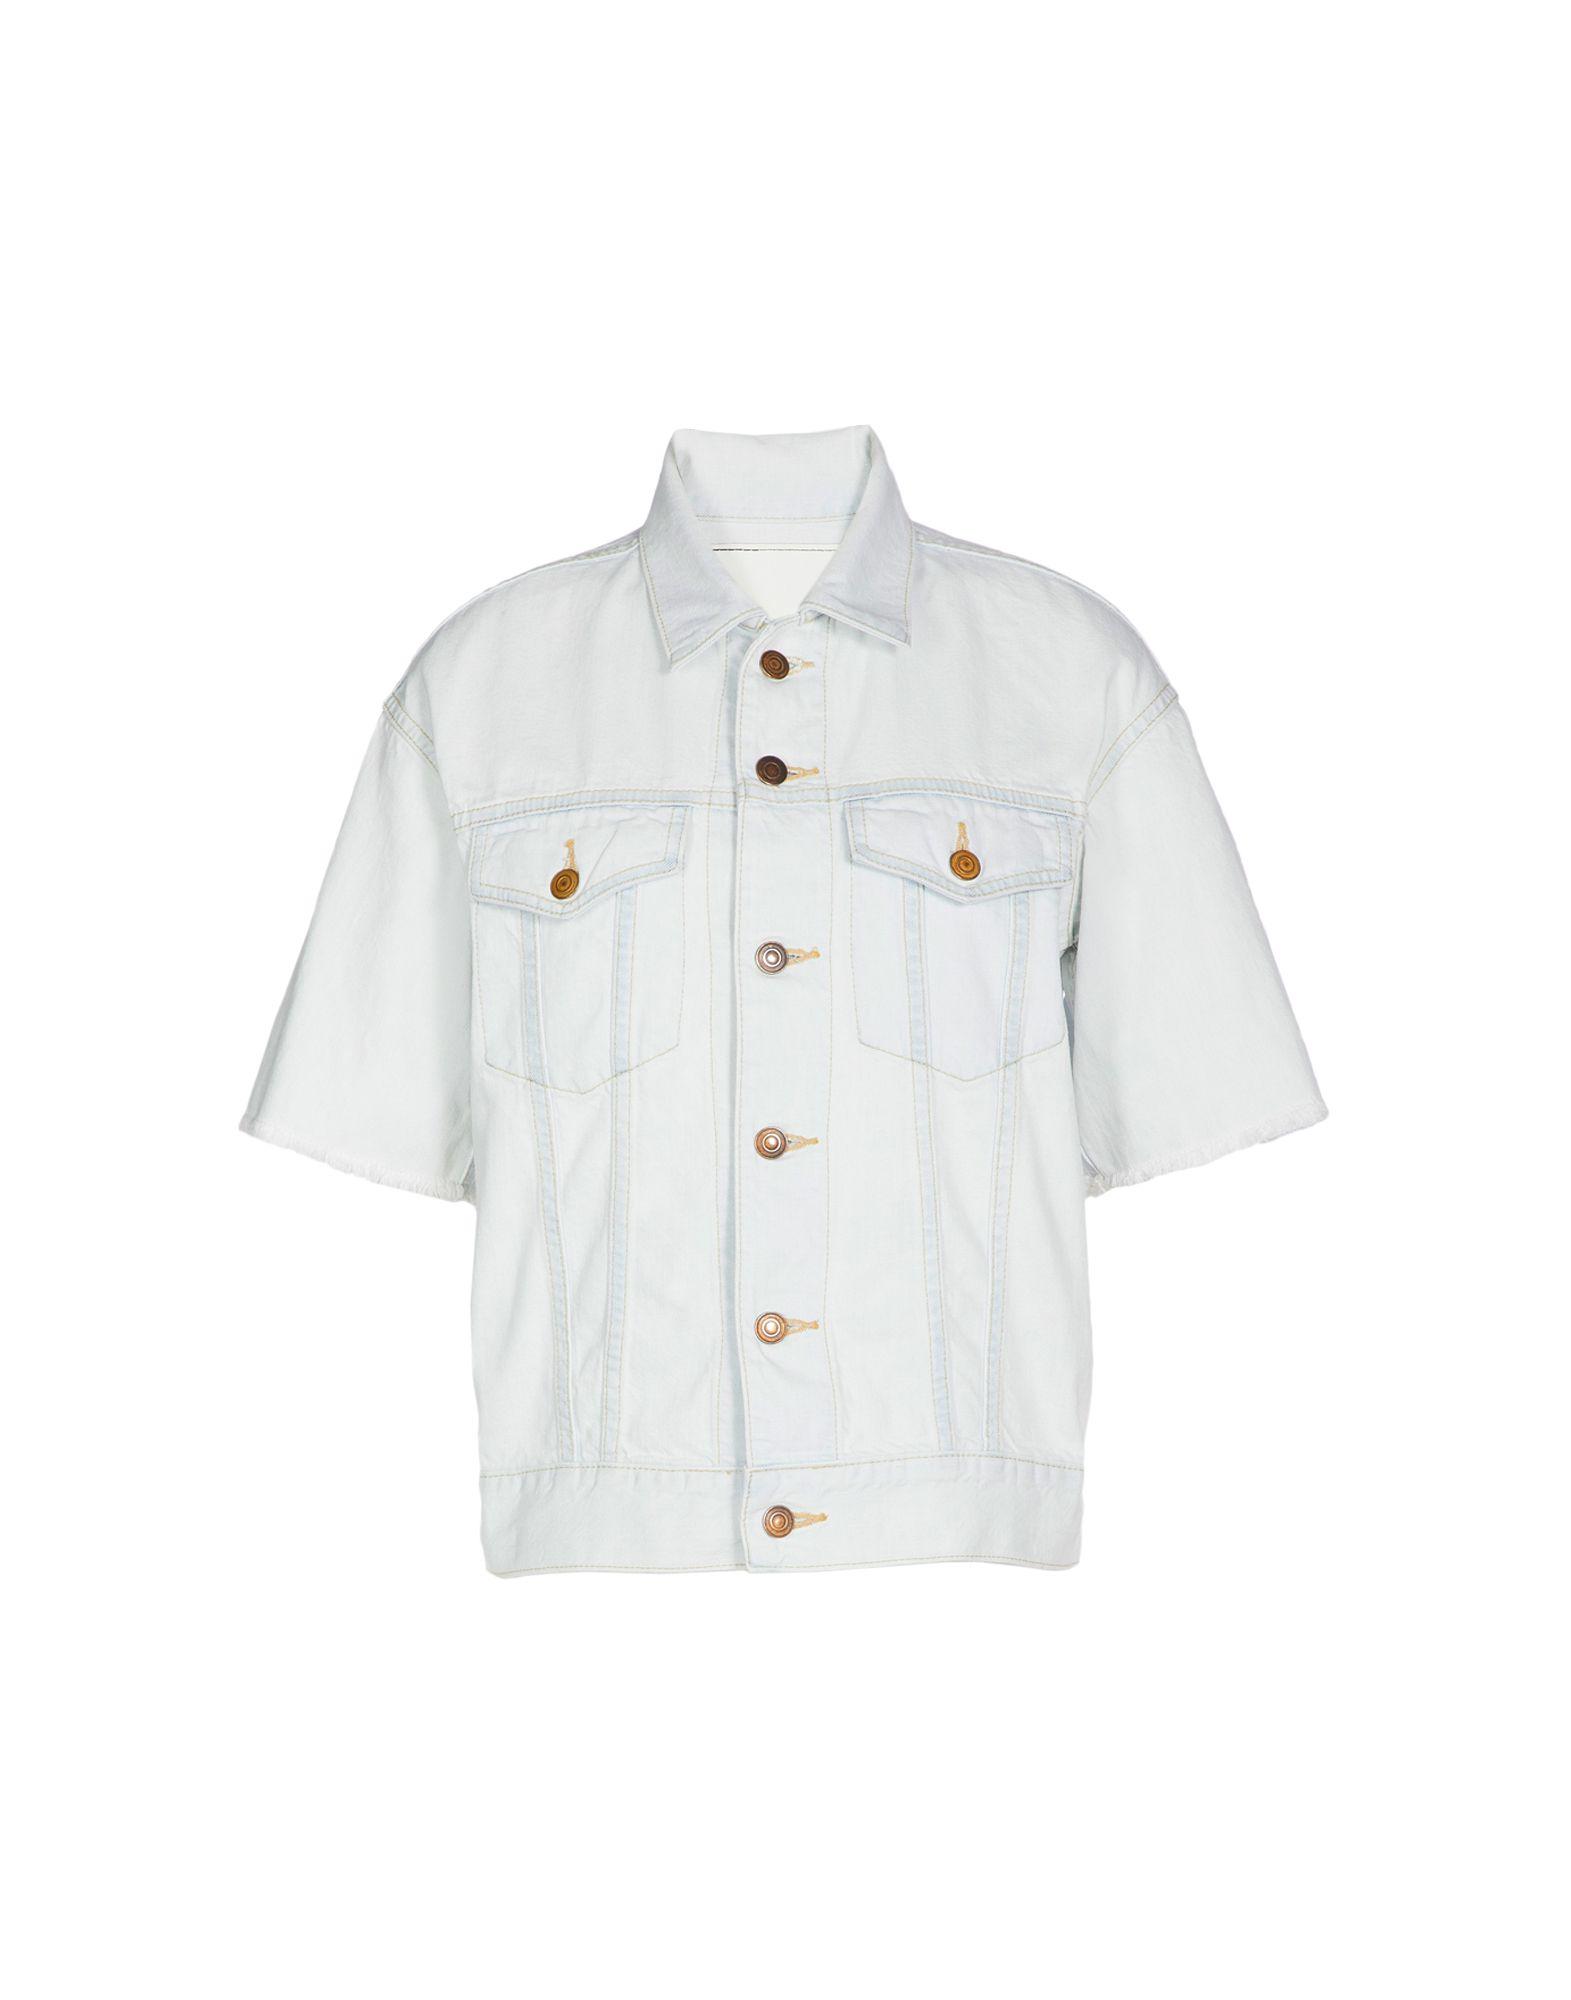 цена BASSIKE Джинсовая верхняя одежда онлайн в 2017 году